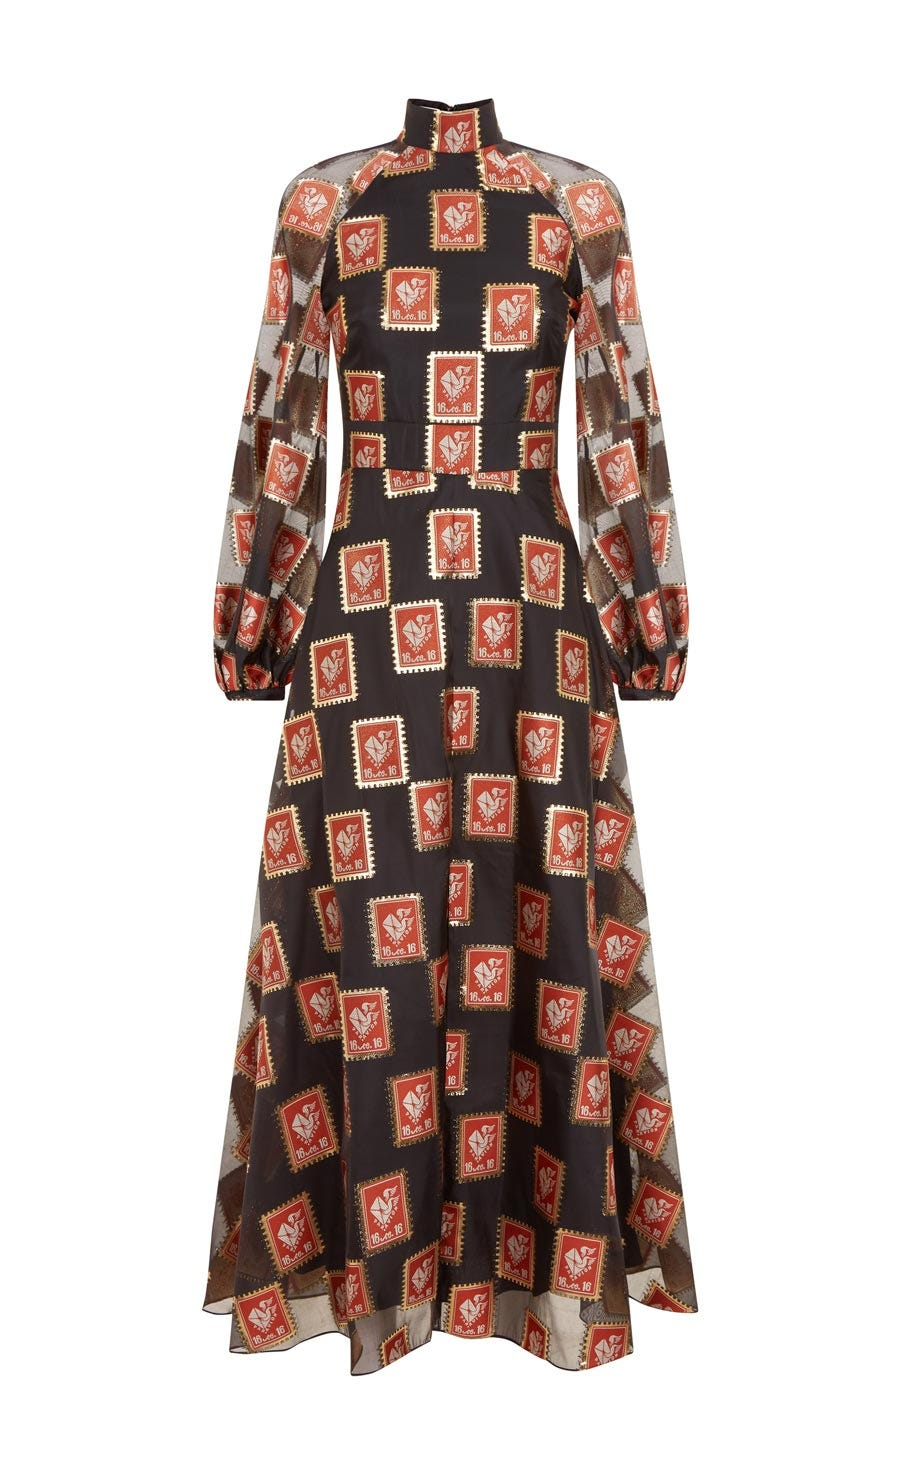 Elinor Sleeved Dress